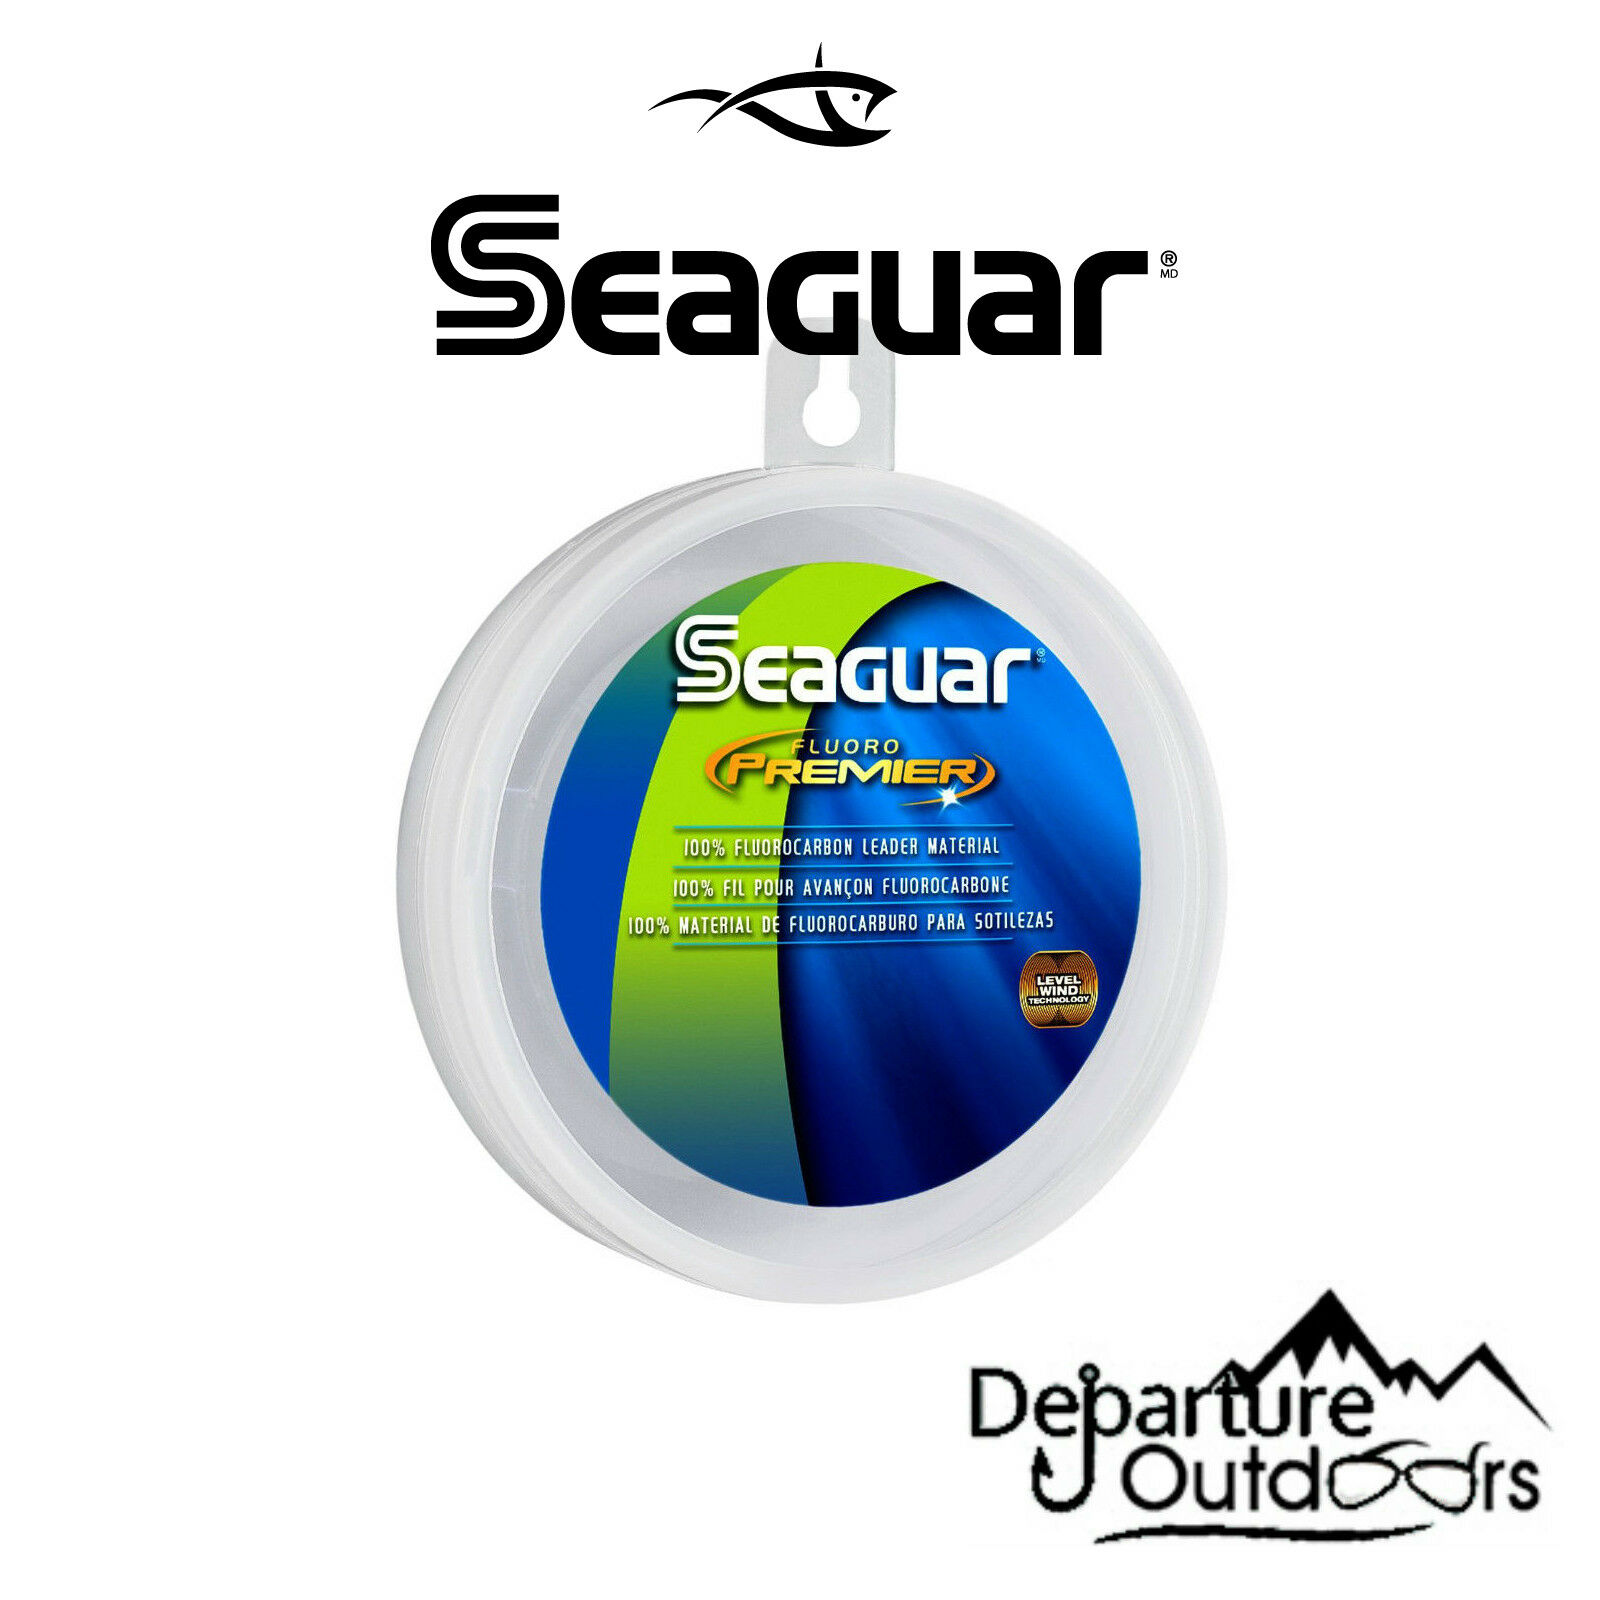 Seaguar Fluoro Premier Fluorocarbon Leader Clear Fishing Line 25 Yards